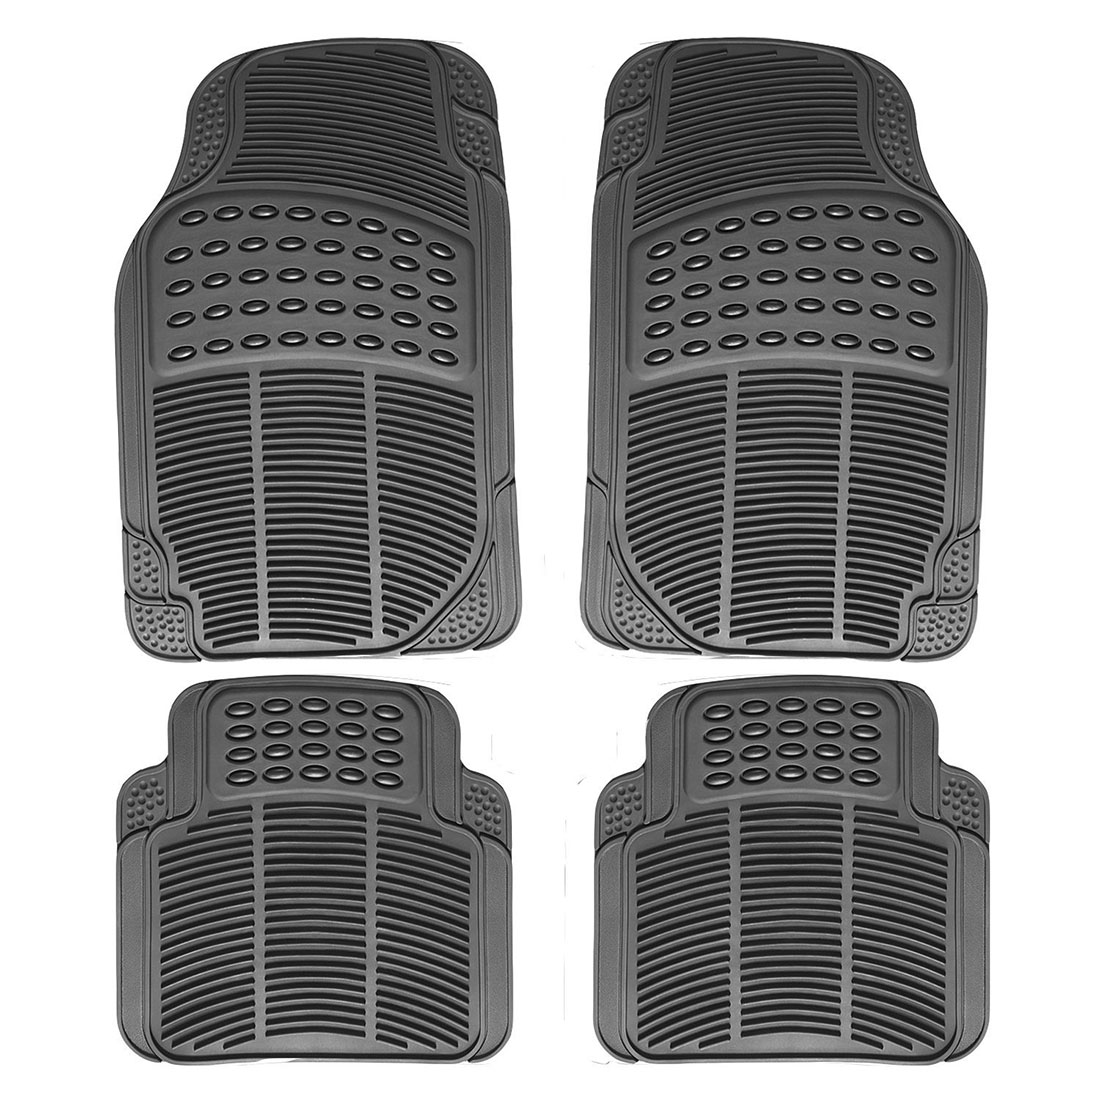 Rubber floor mats price - Auto Multi Season Rubber Floor Mats 4pc Set Black Fit Most Cars Suvs Vans